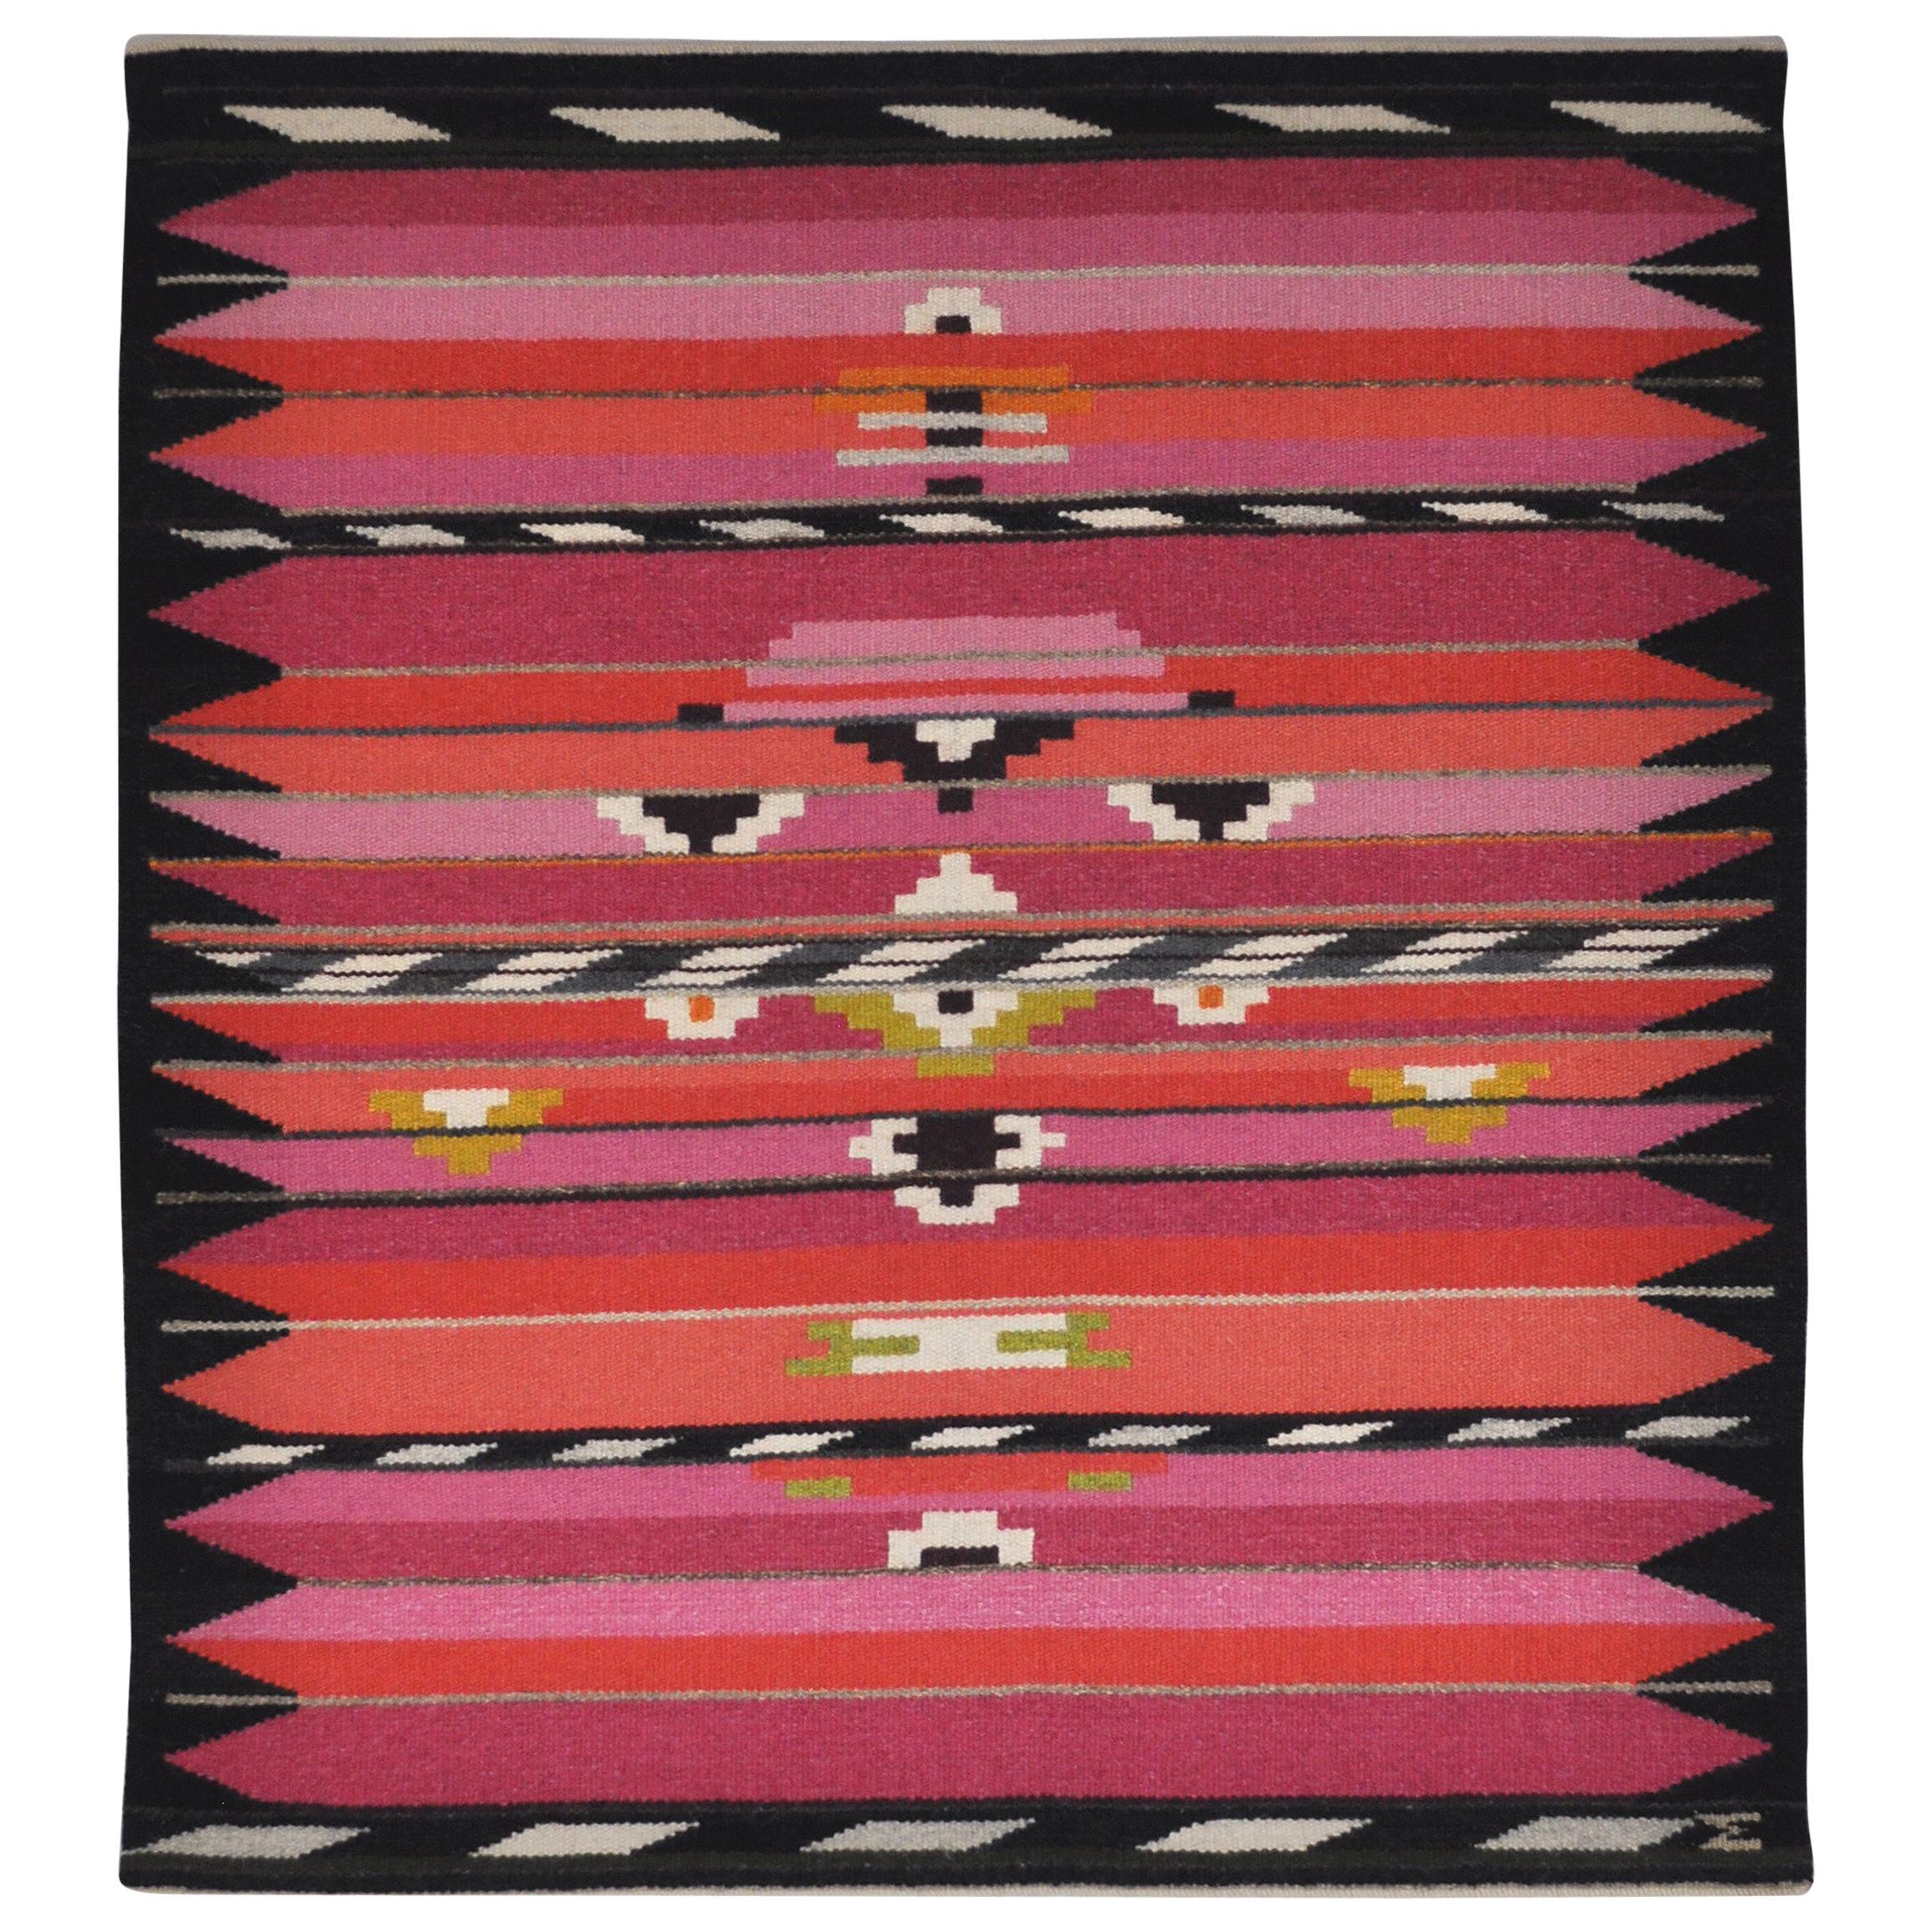 Handwoven Contemporary Scandinavian Wool Tapestry